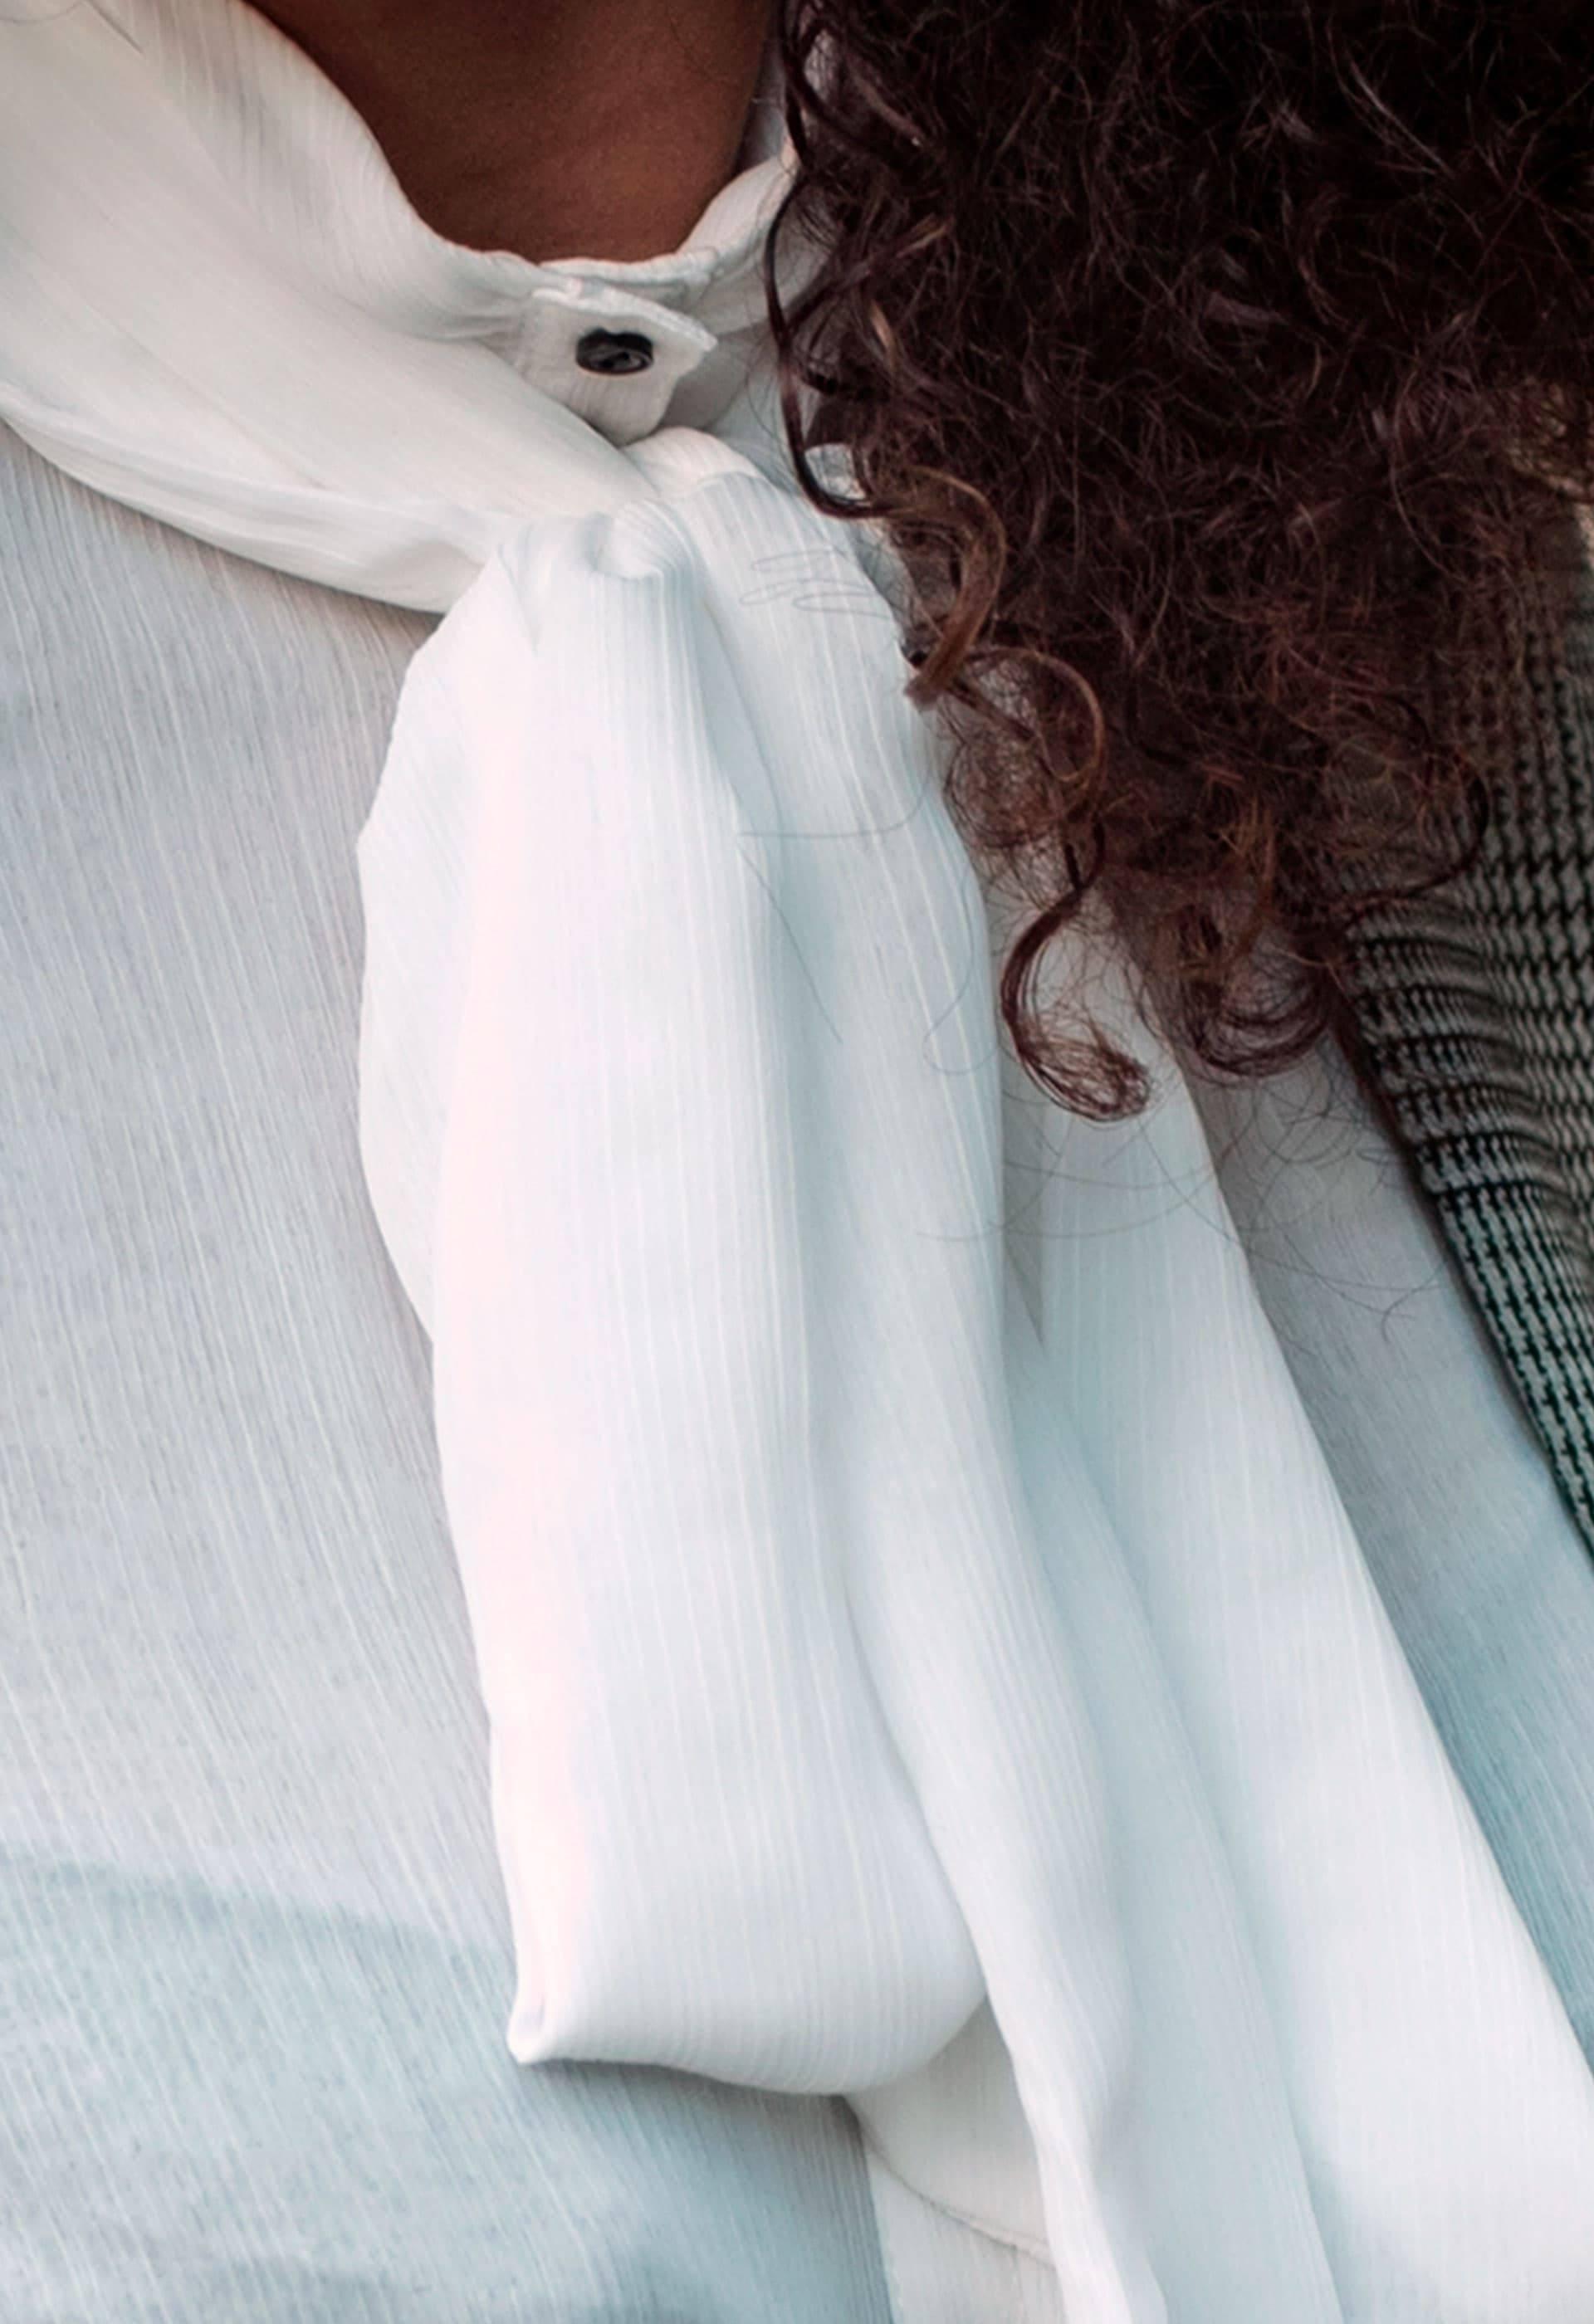 Detalle de la blusa Akanke de bambula blanca